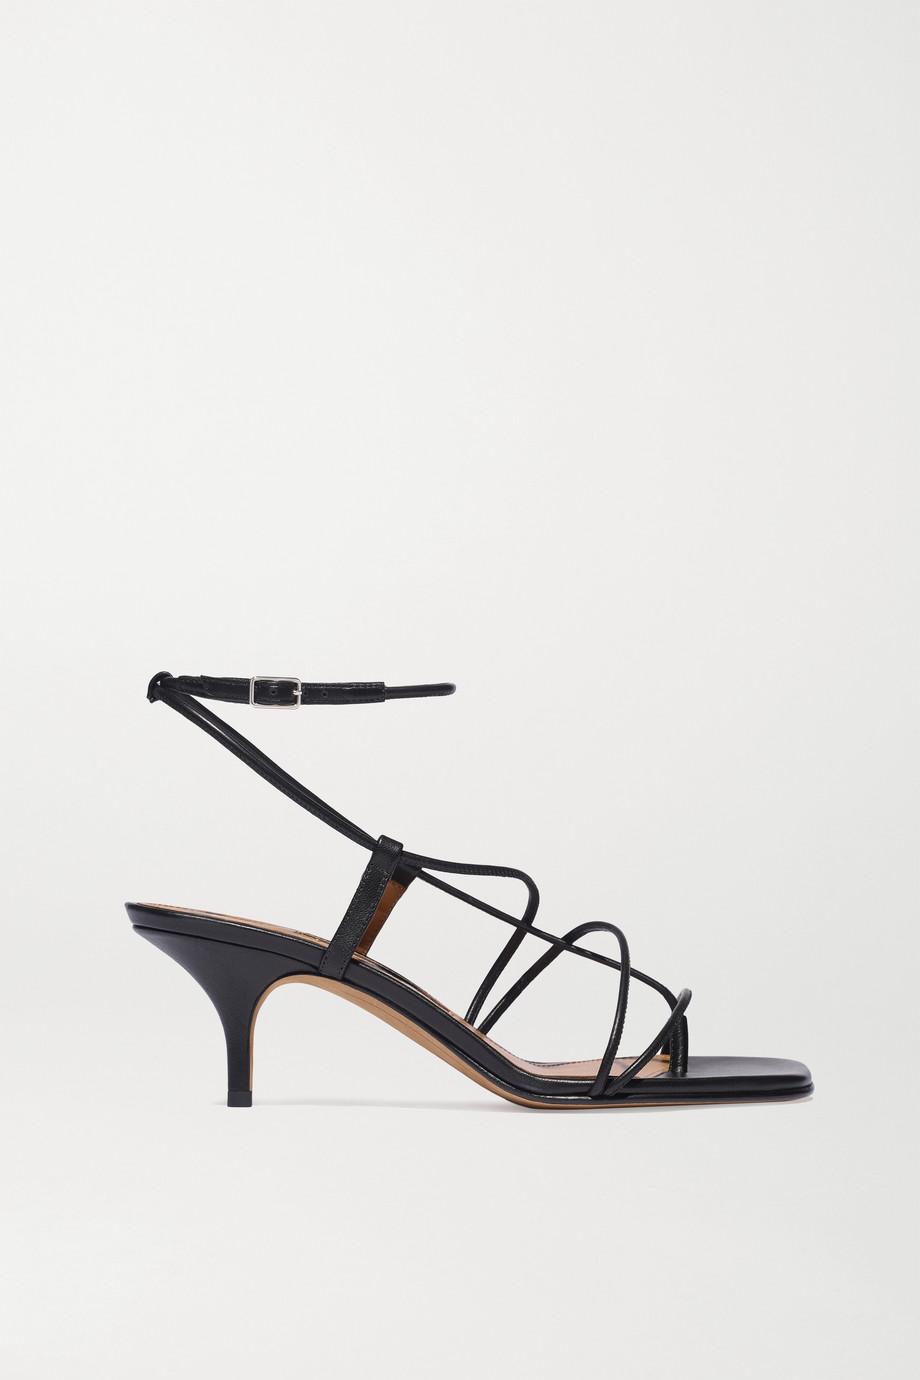 Emme Parsons Tobias 皮革凉鞋